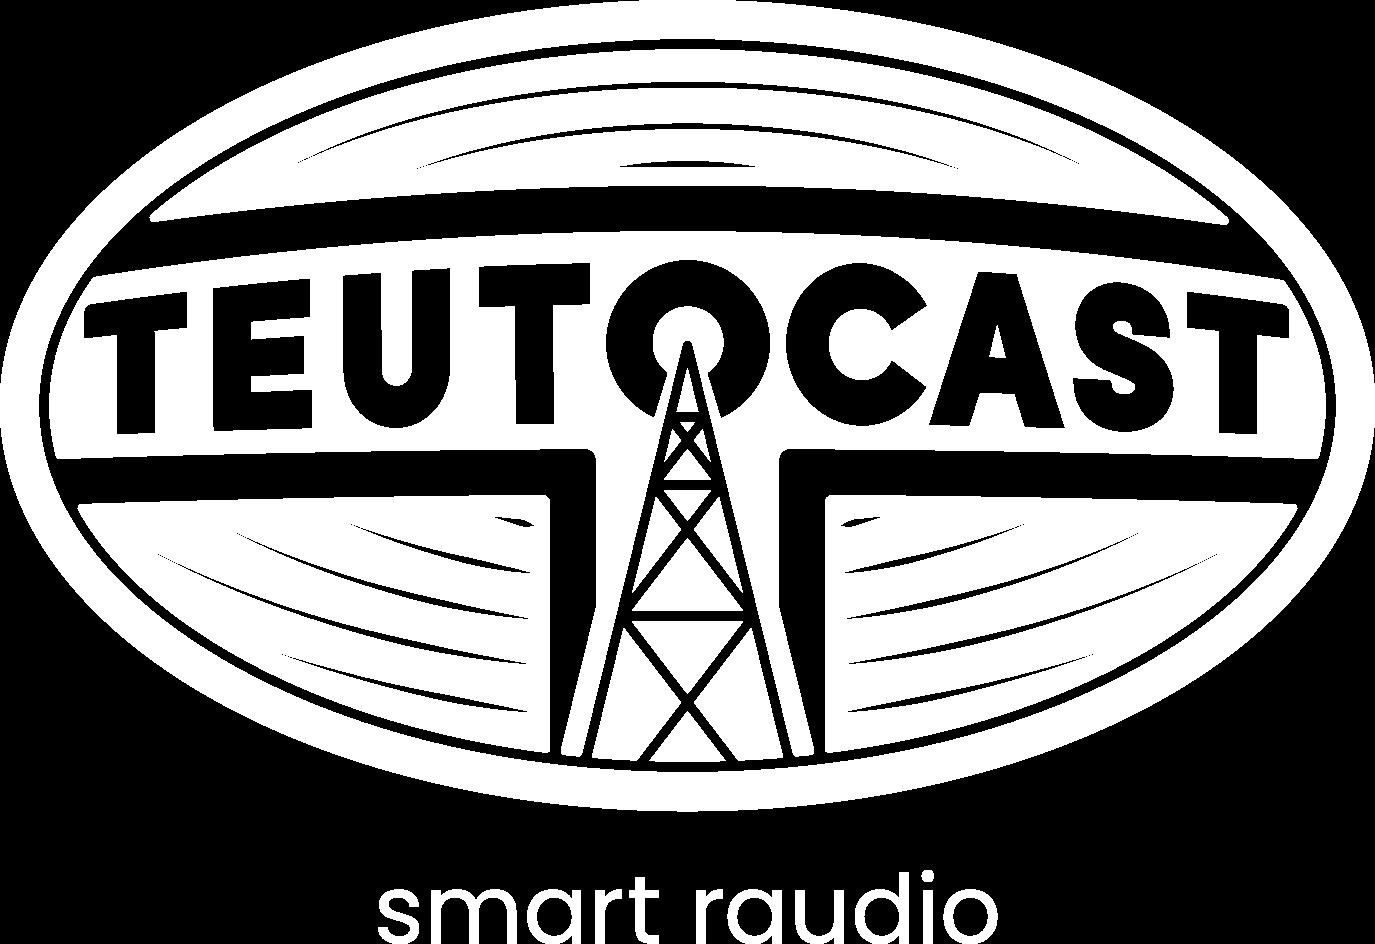 Logo TEUTOCAST smart raudio